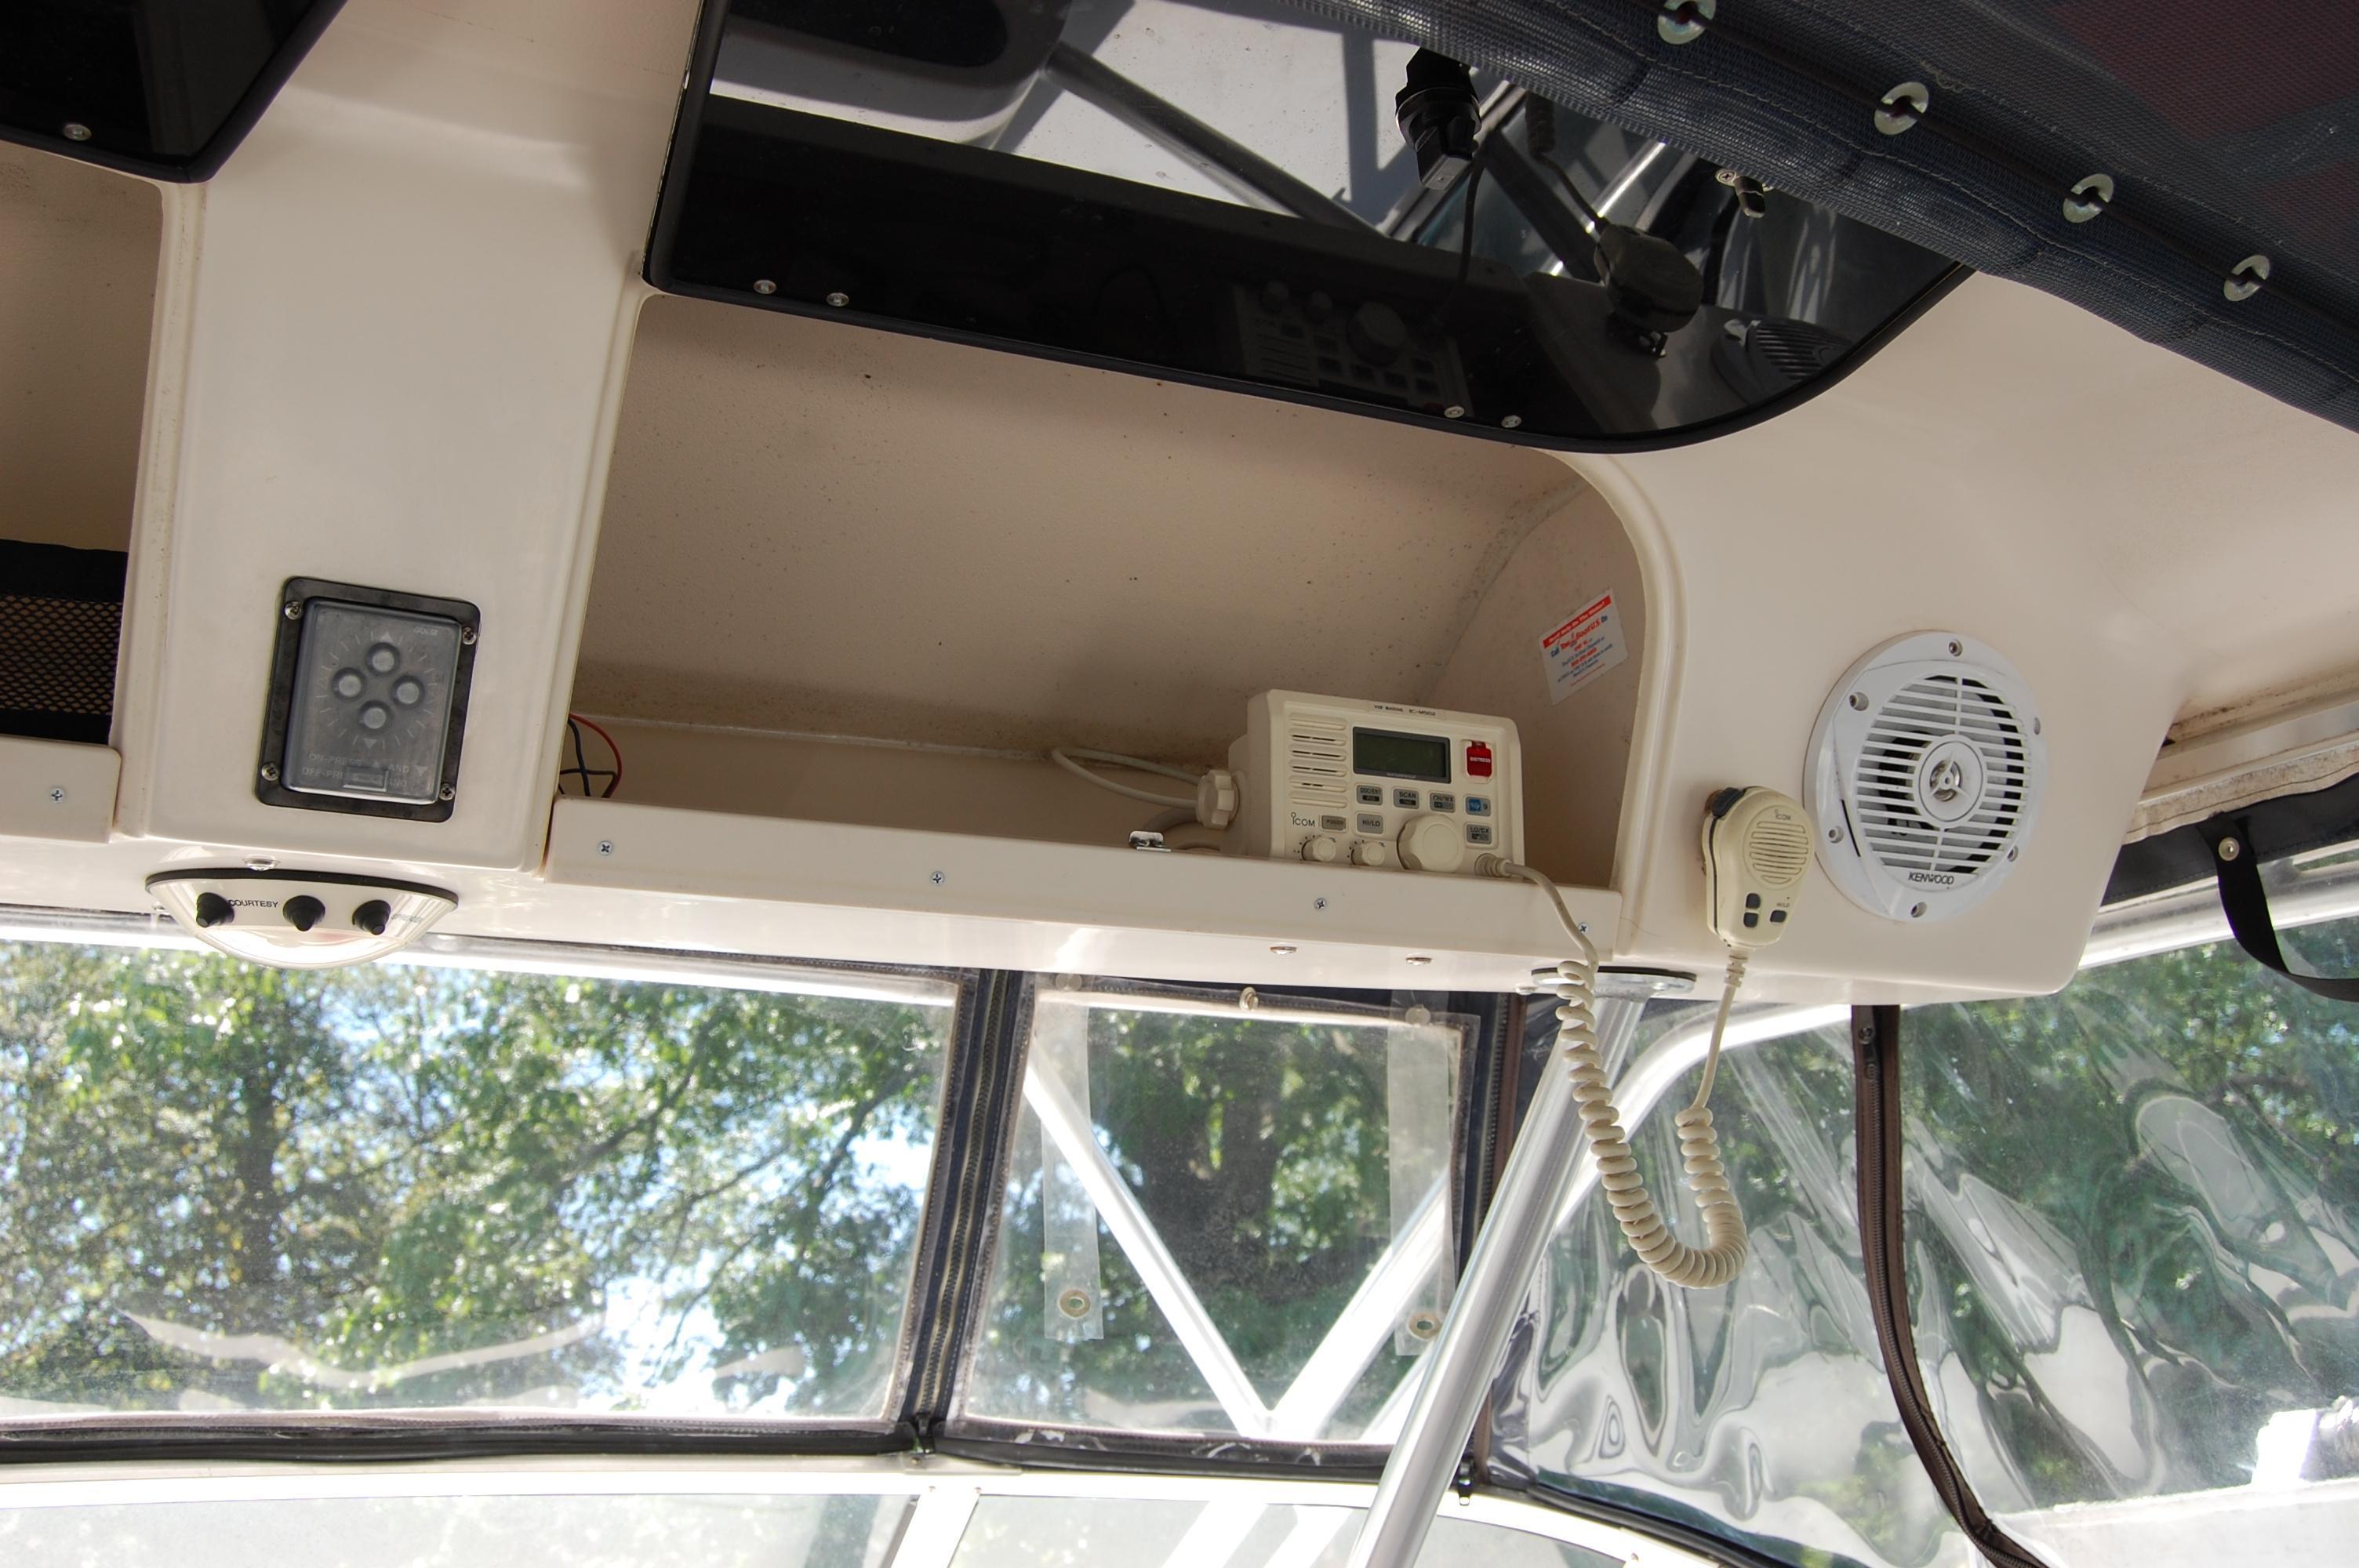 2002 Grady White 330 Express, Icom VHF Radio, Guest remote spotlight, Dome light